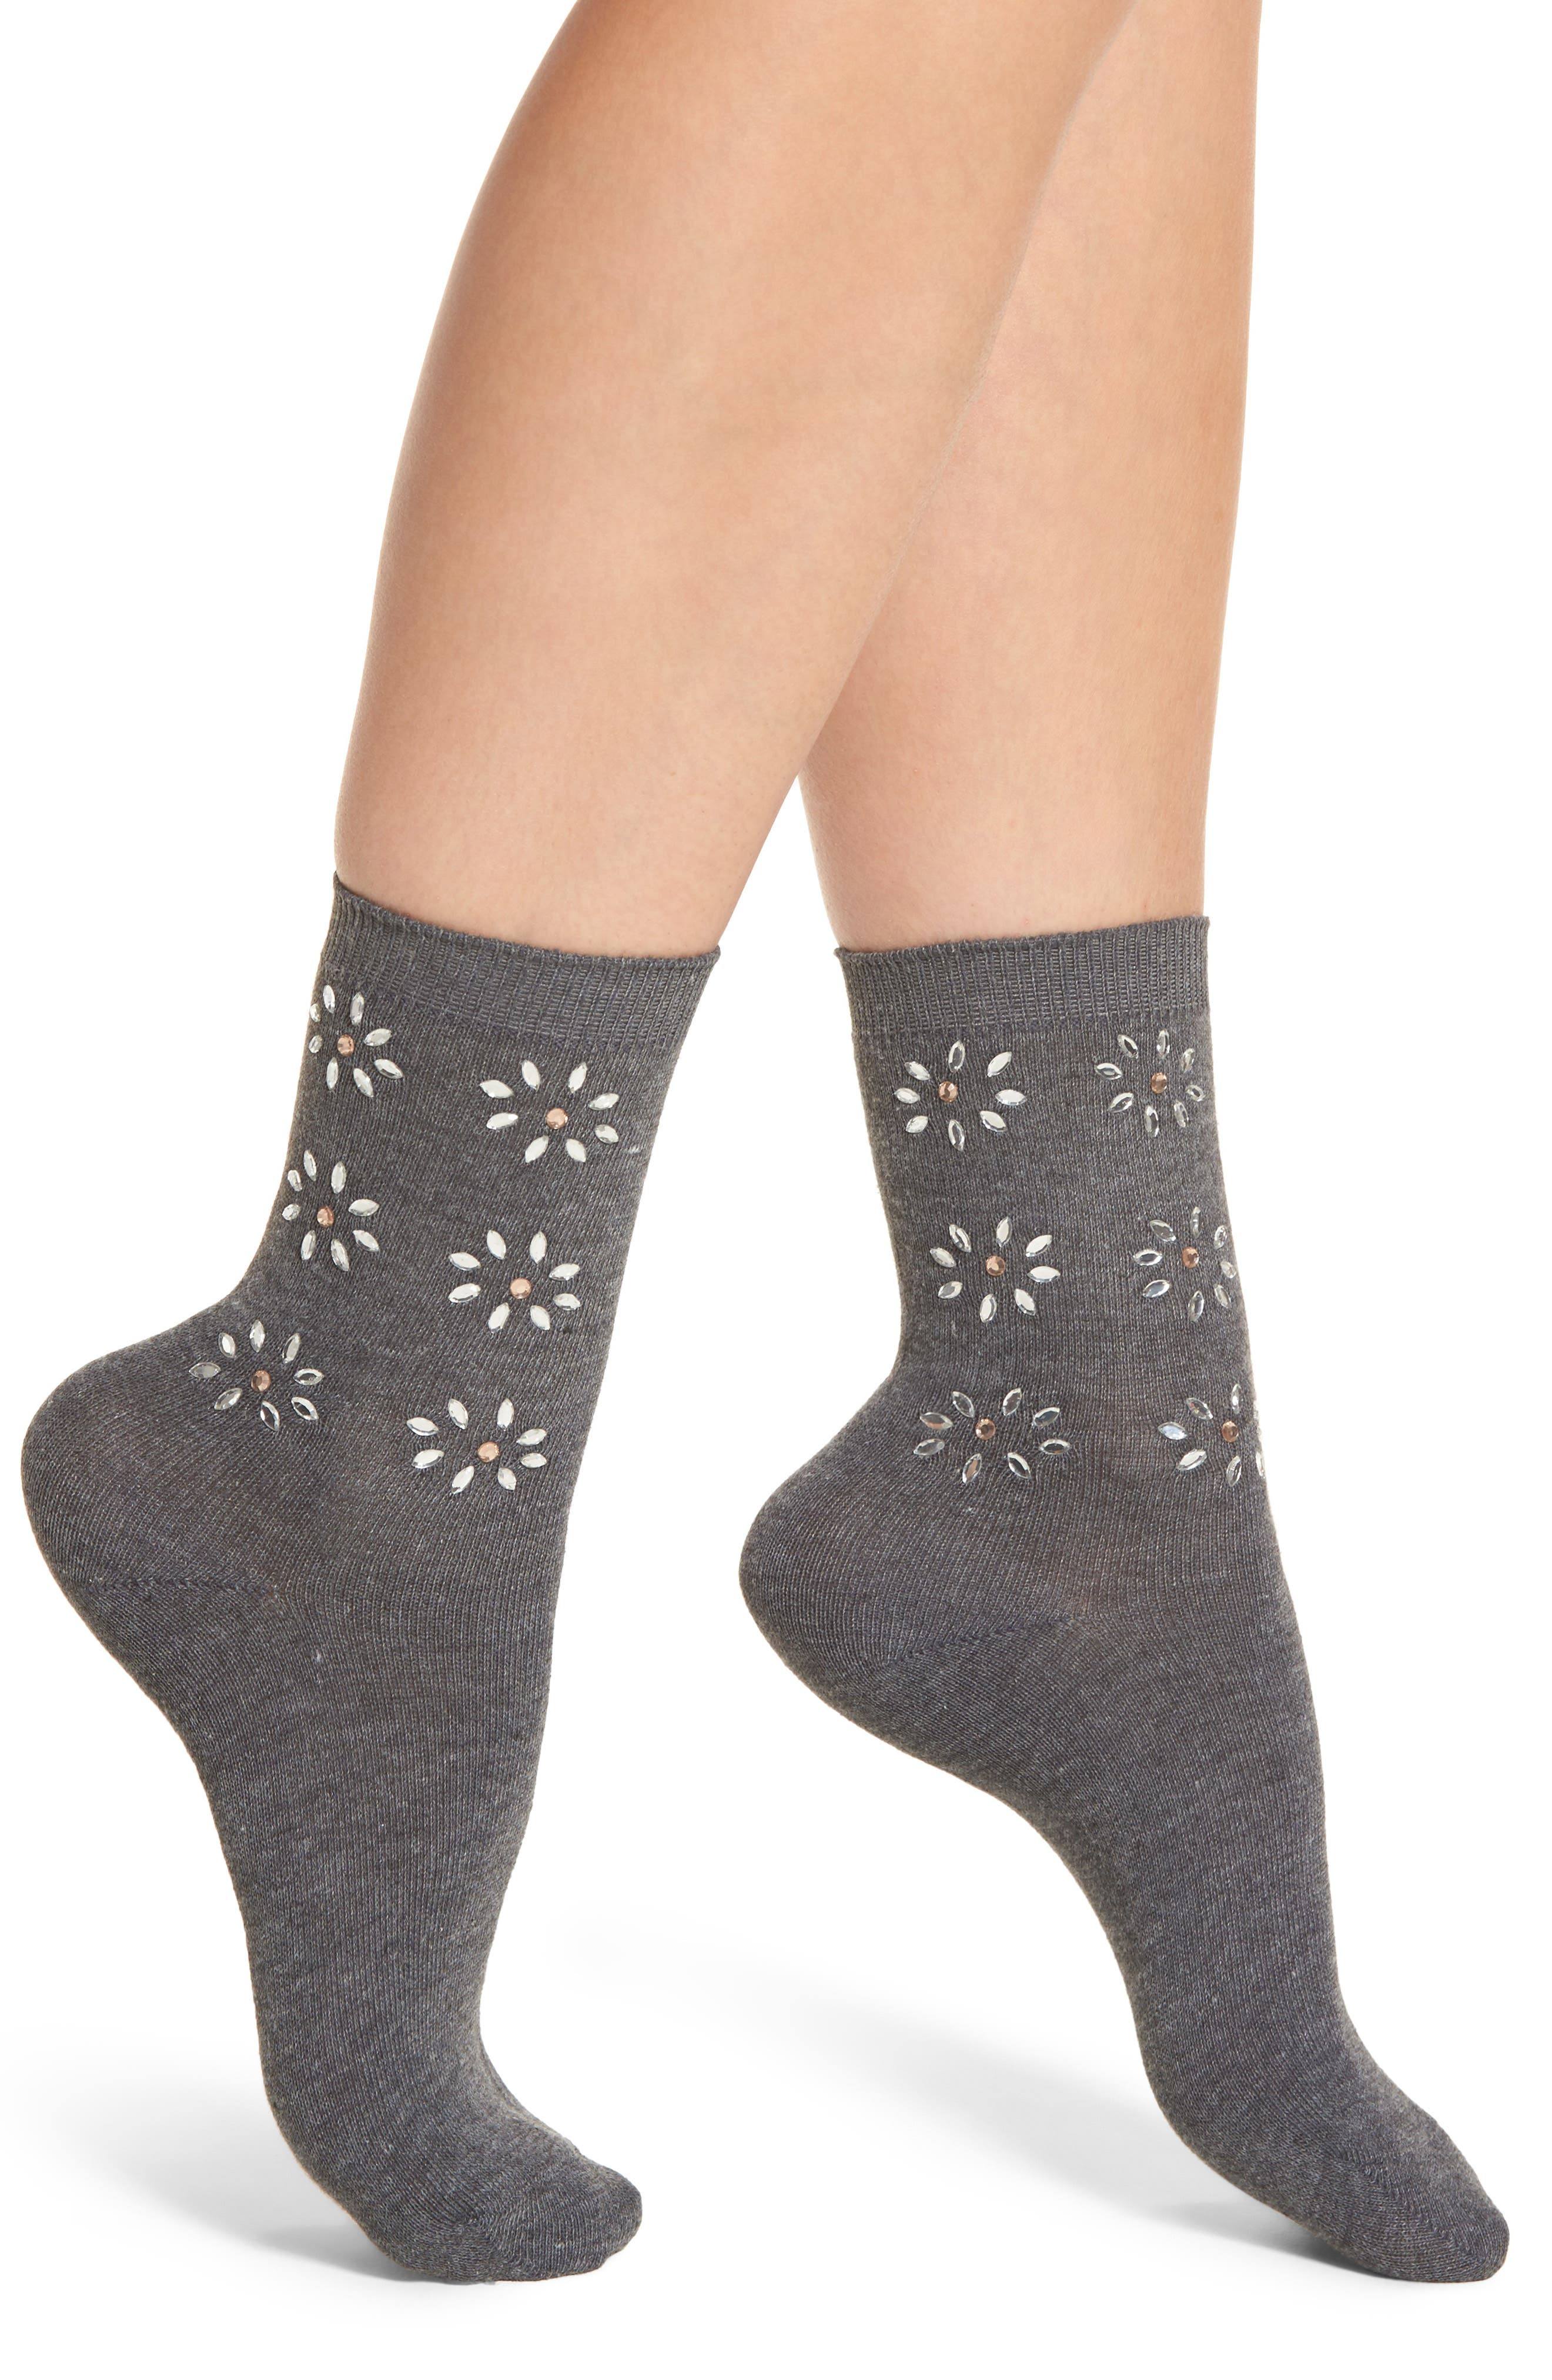 Crystal Flower Crew Socks,                         Main,                         color, 020